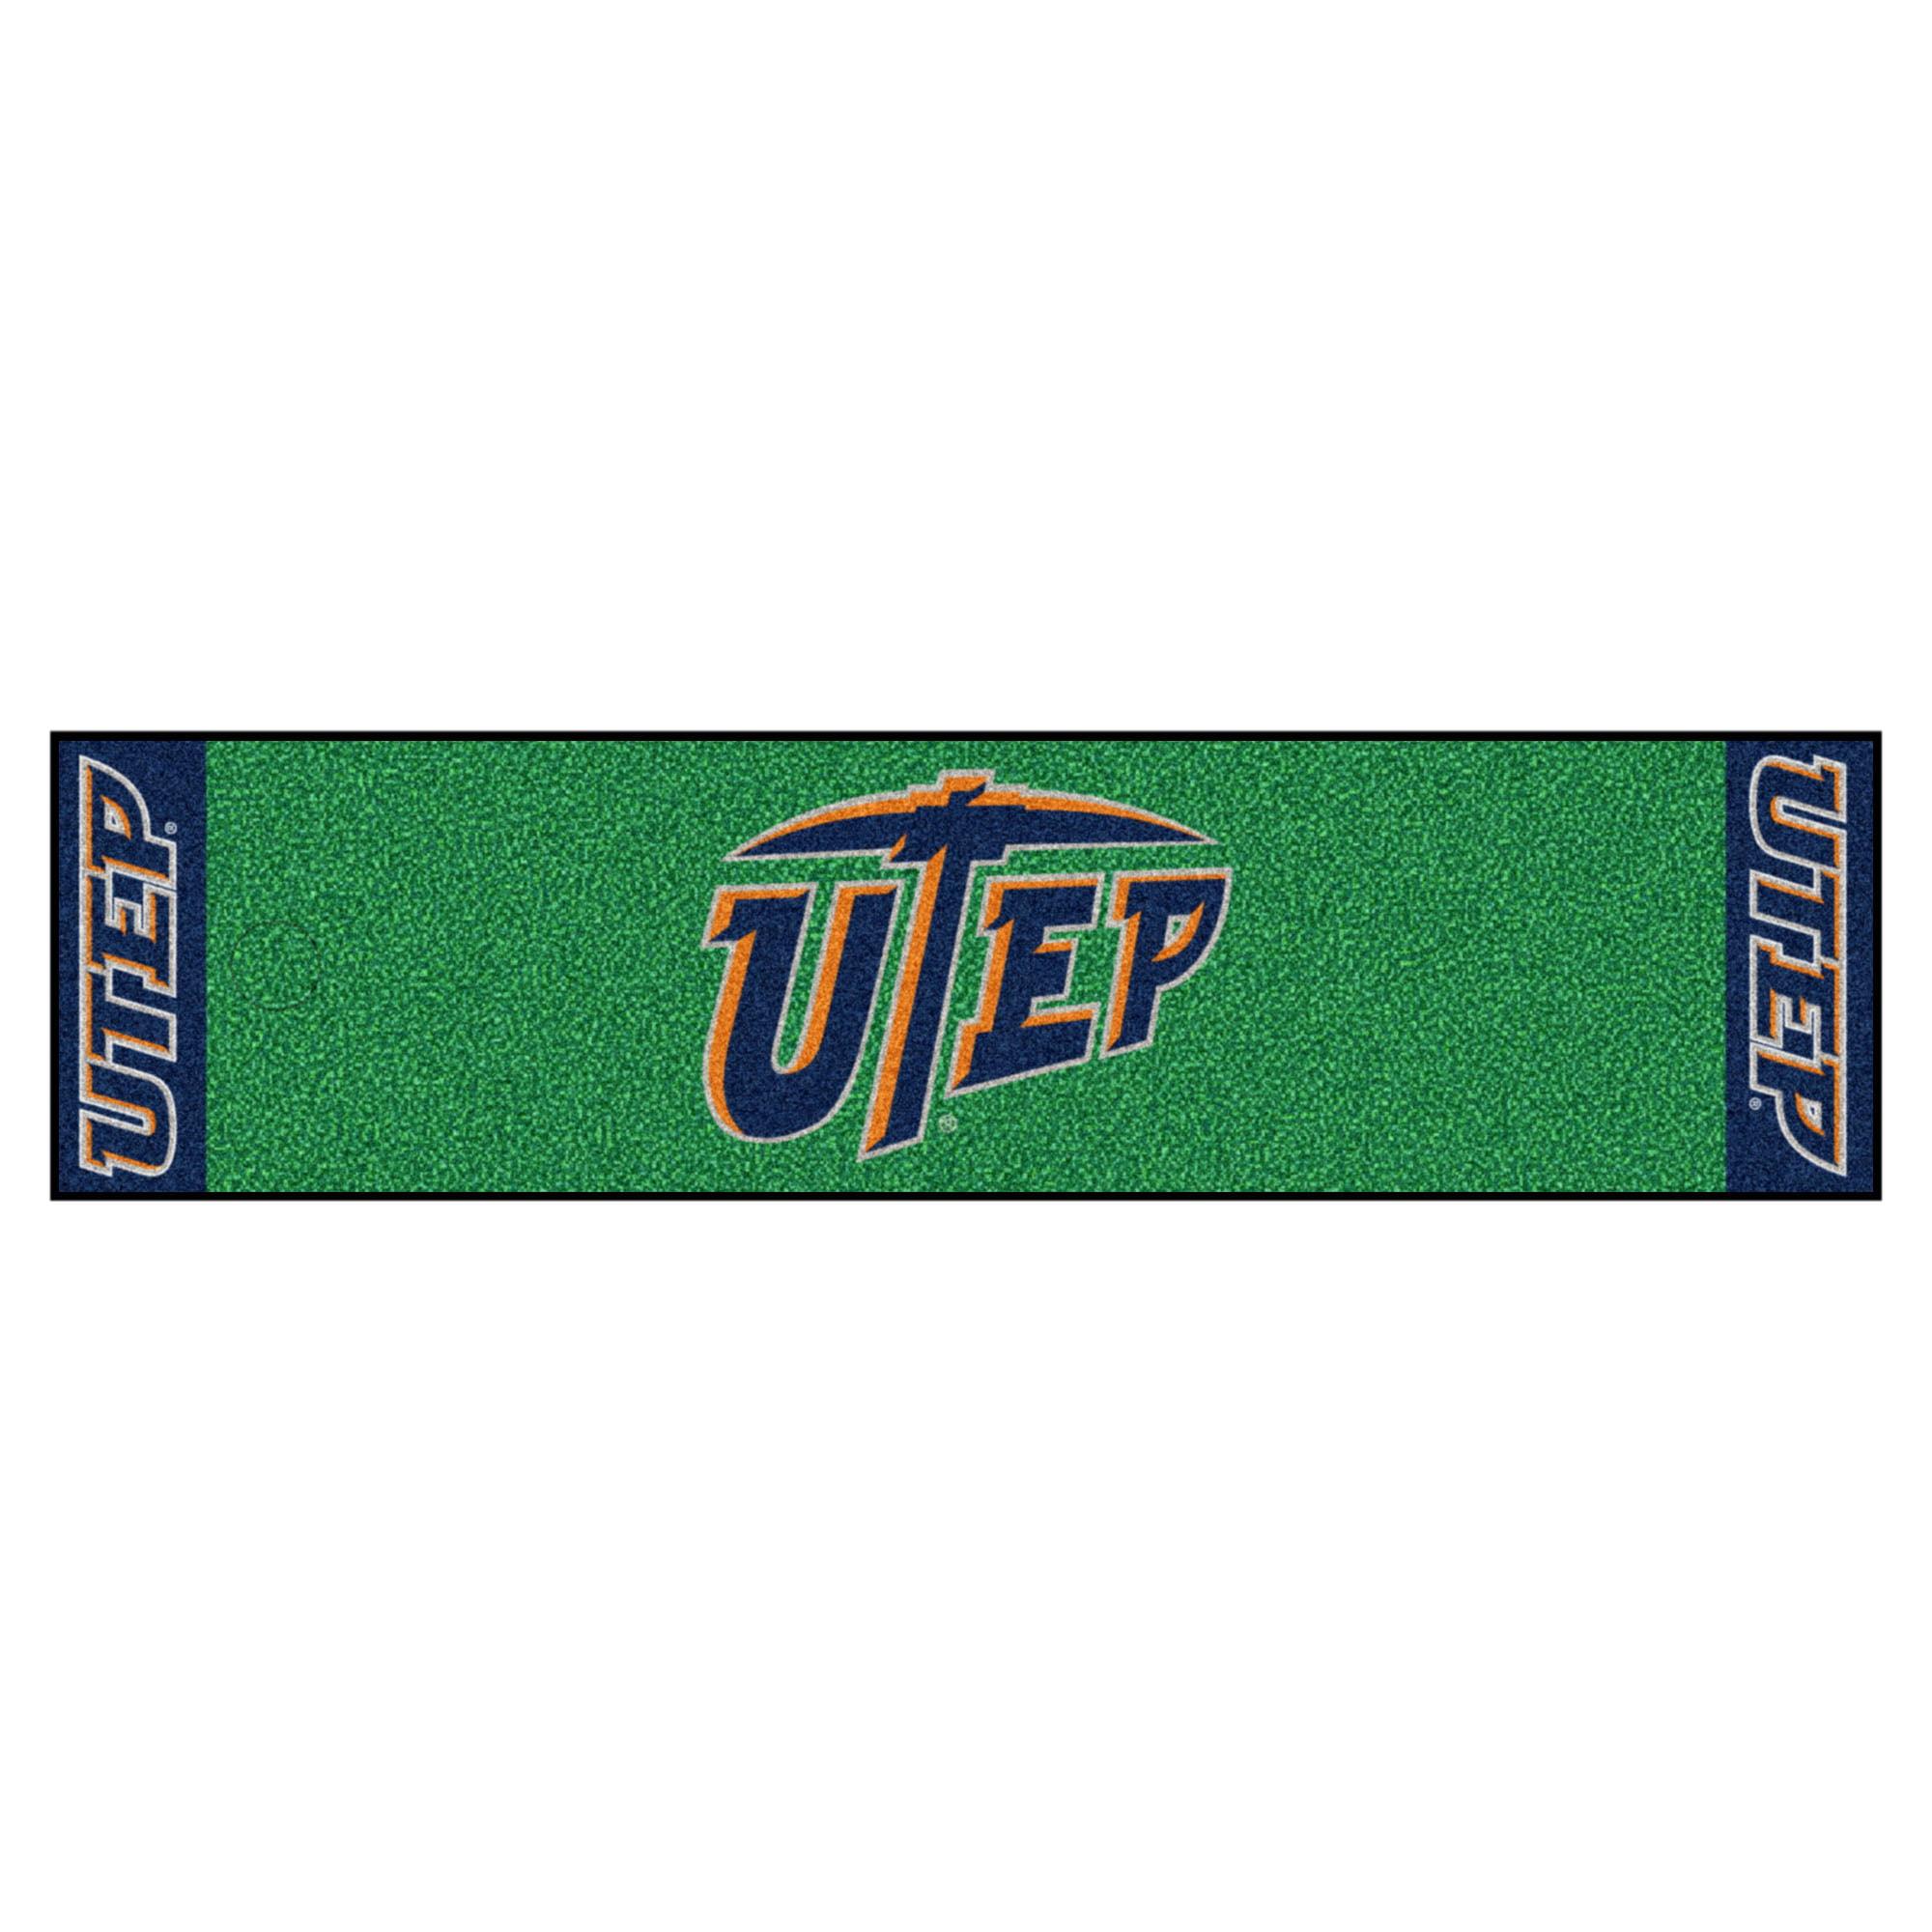 UTEP Miners Apparel